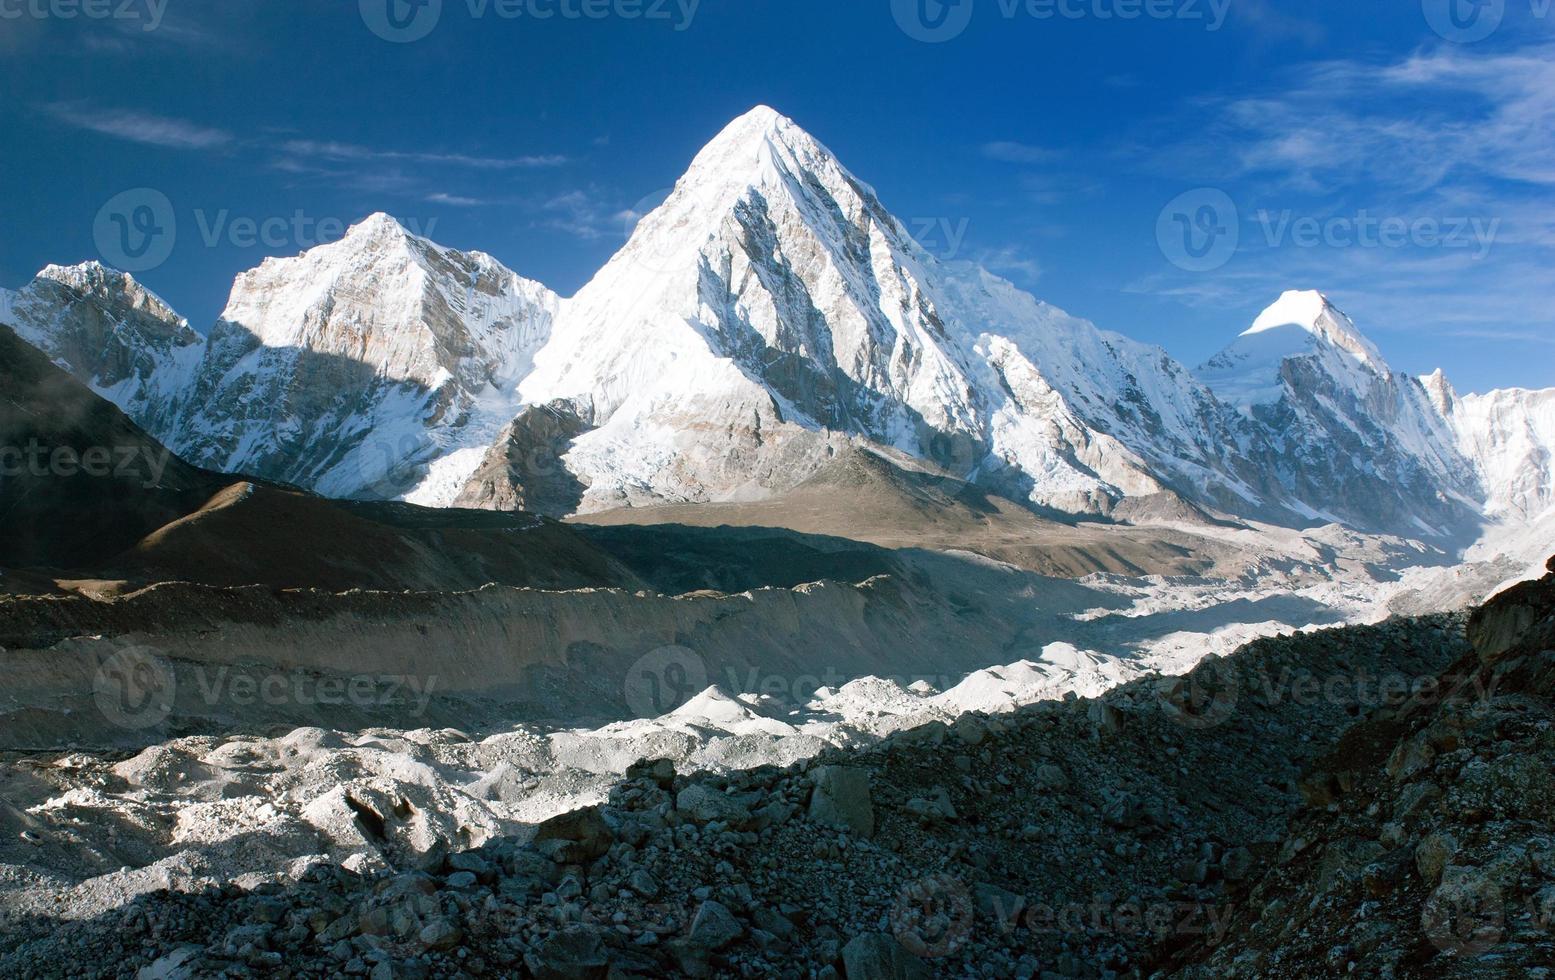 khumbu dal, khumbu glaciär och pumo ri topp foto